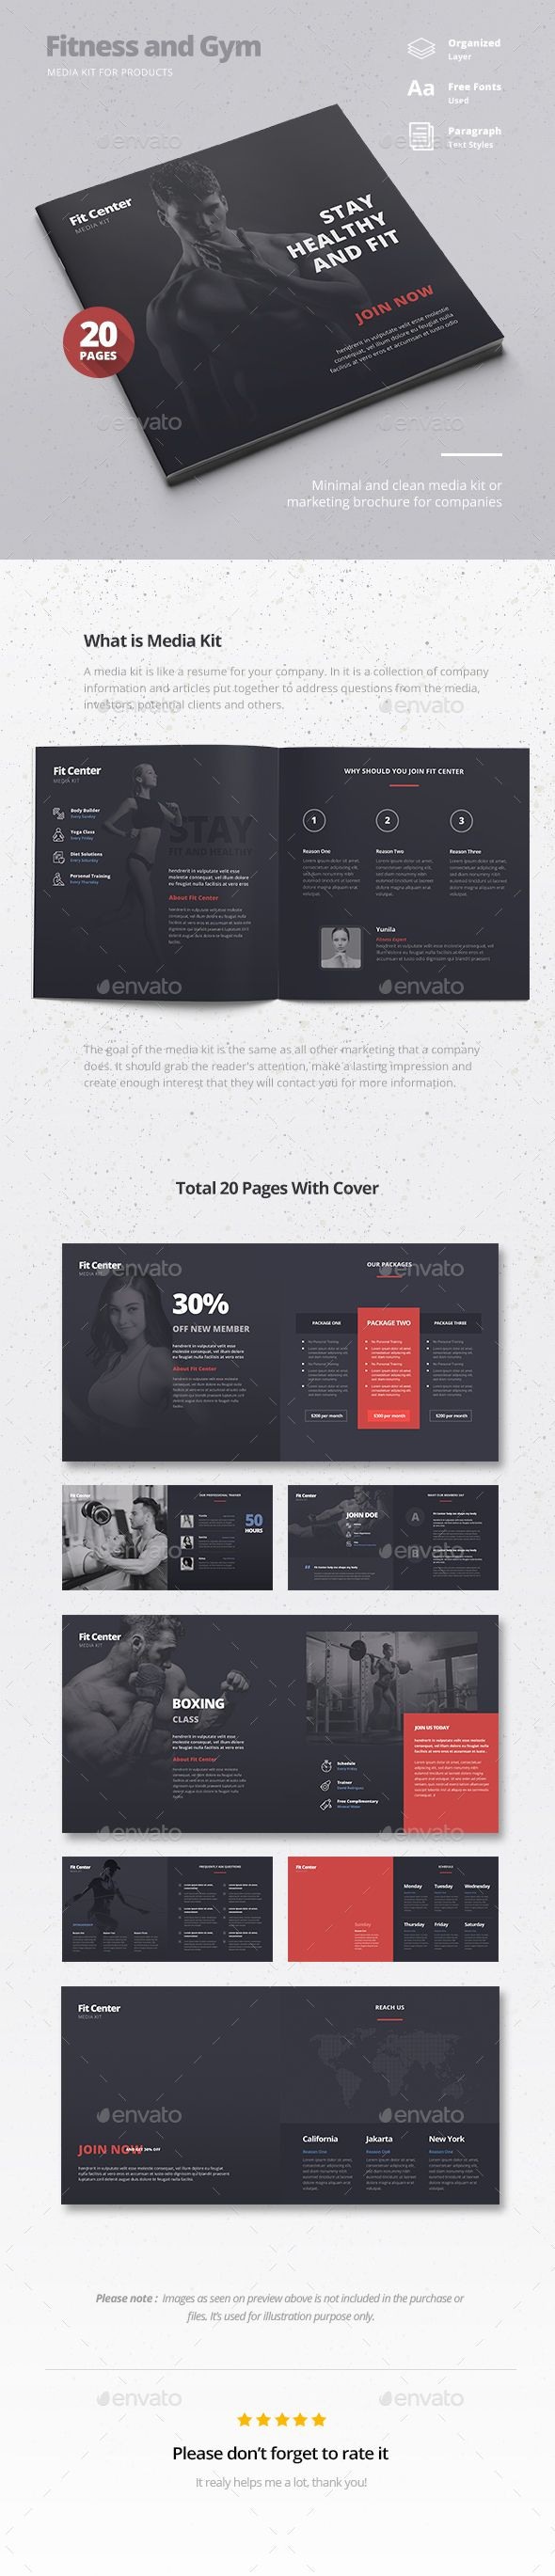 fitness brochure design - fitness gym media kit brochure template psd design